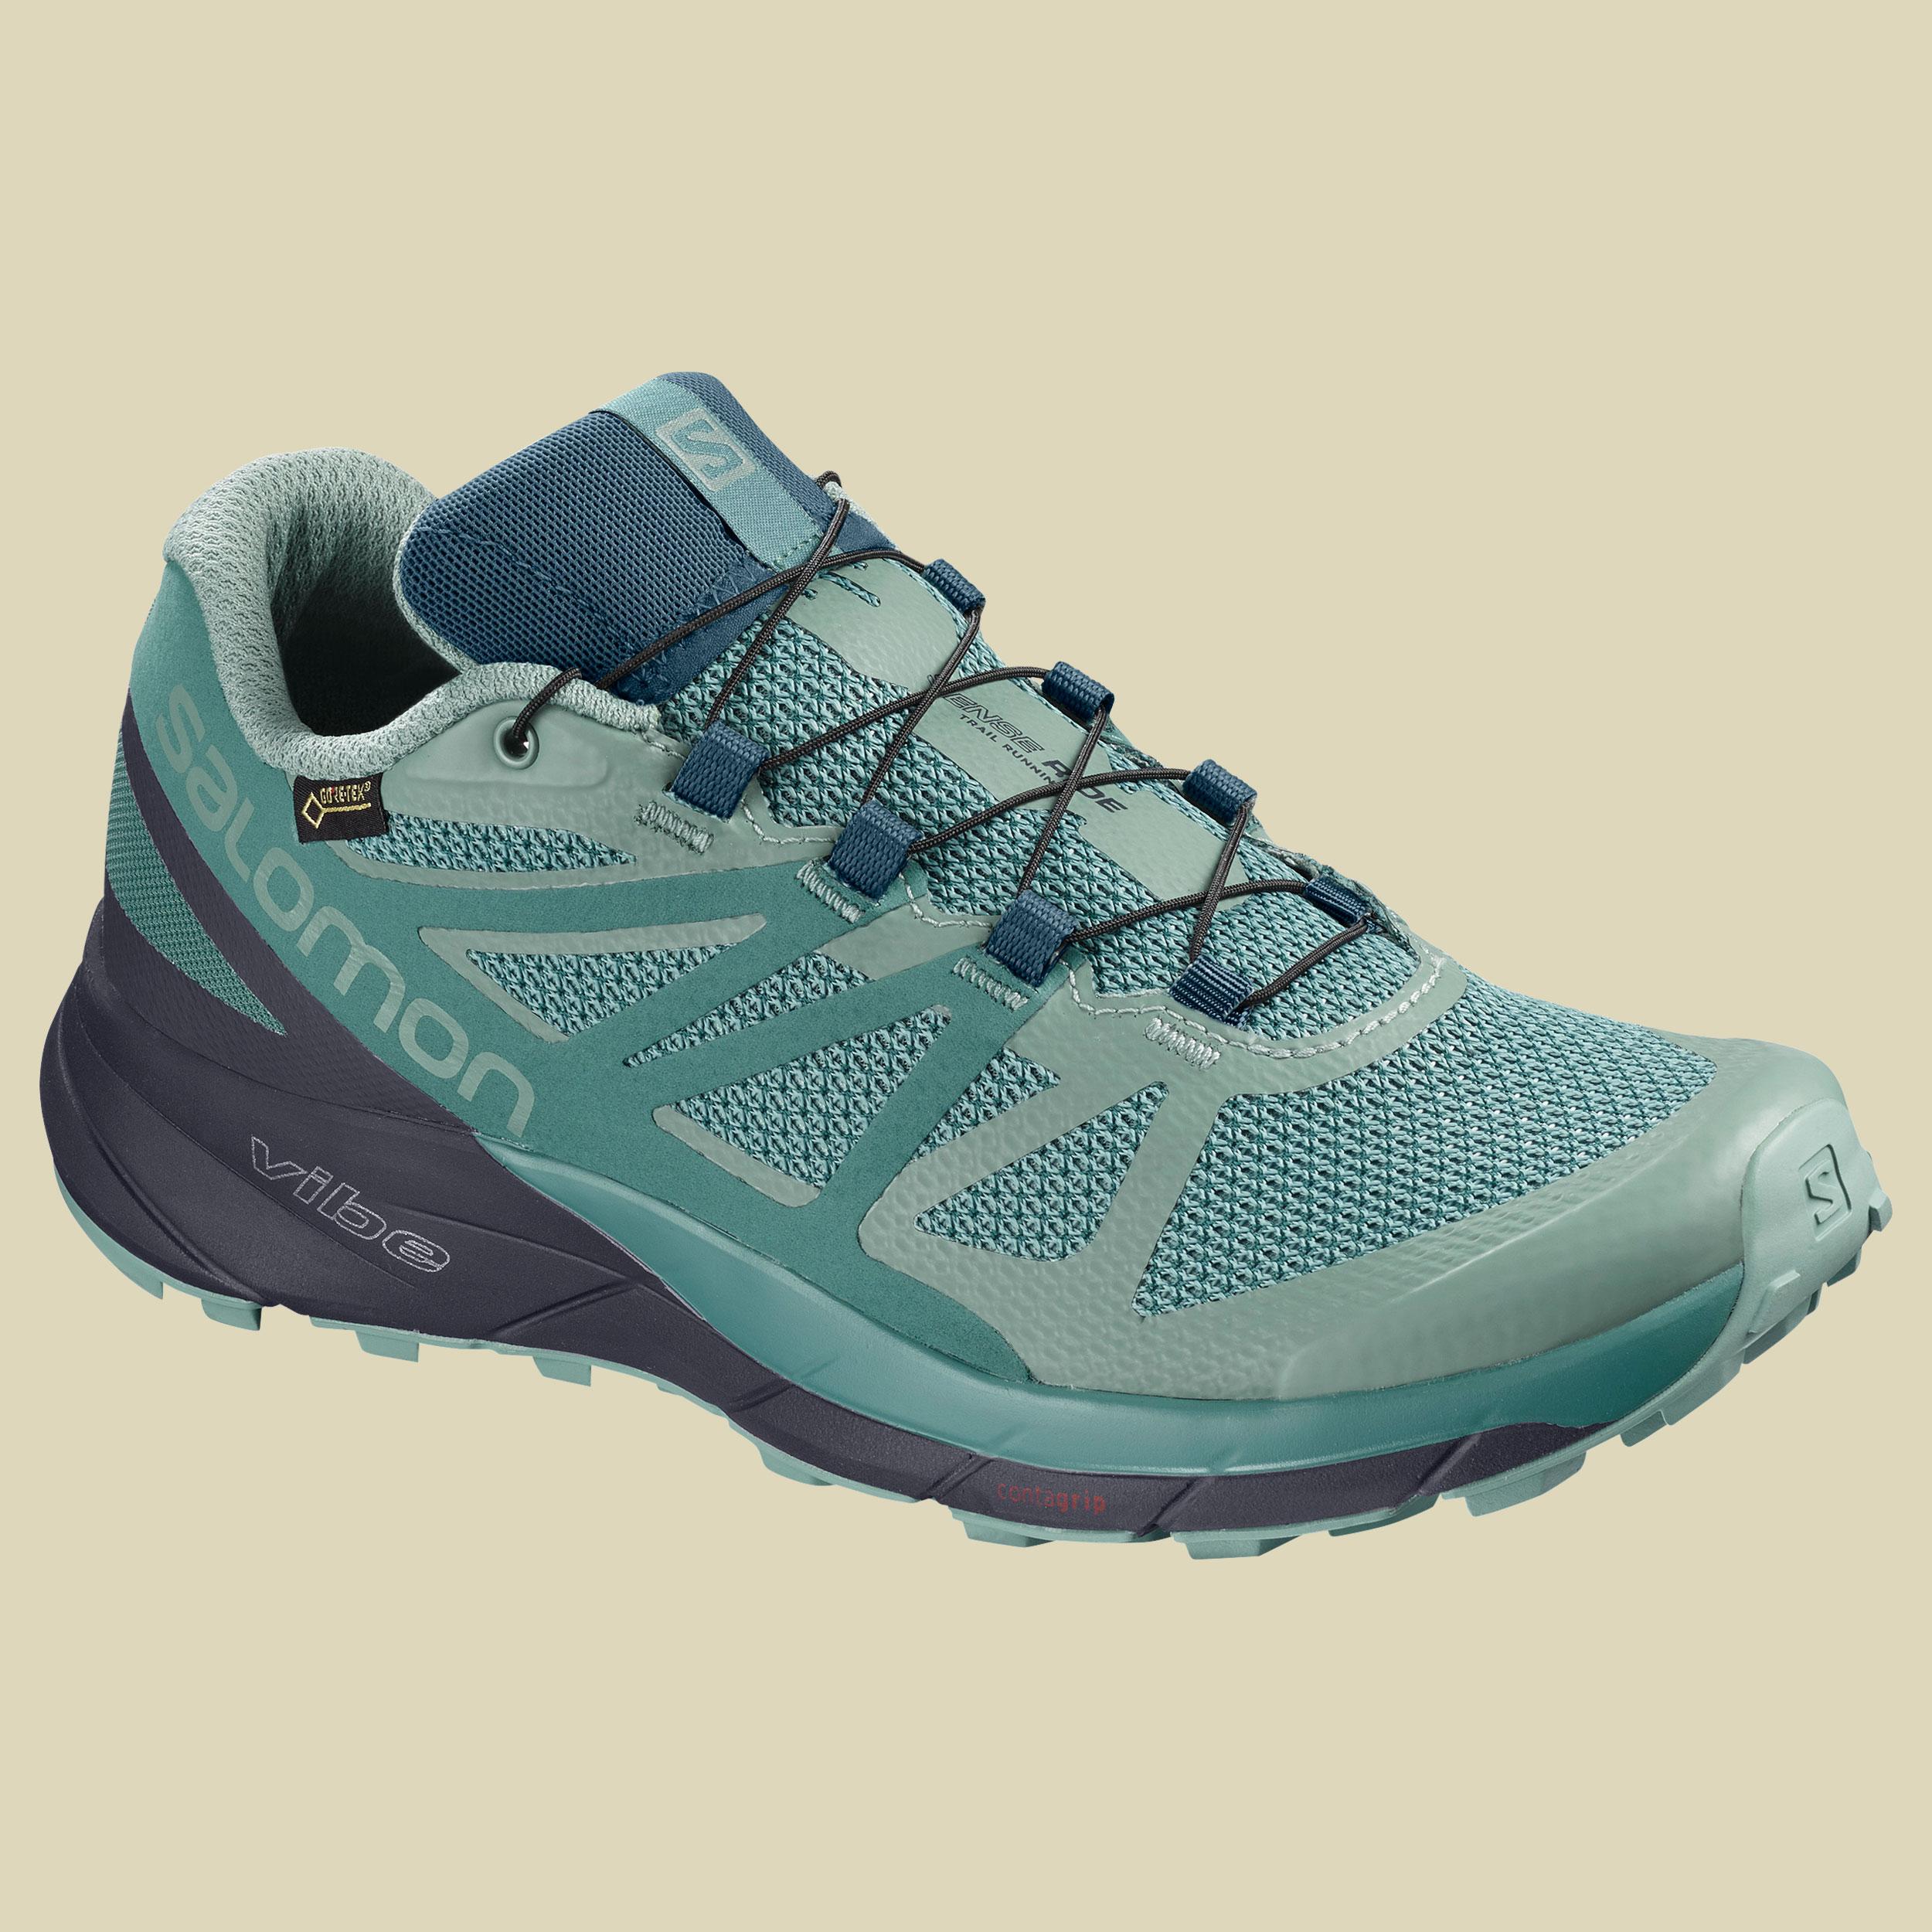 Salomon Sense Ride GTX Invisible Fit Women Damen Laufschuh Größe UK 4,5 trellis/graphite